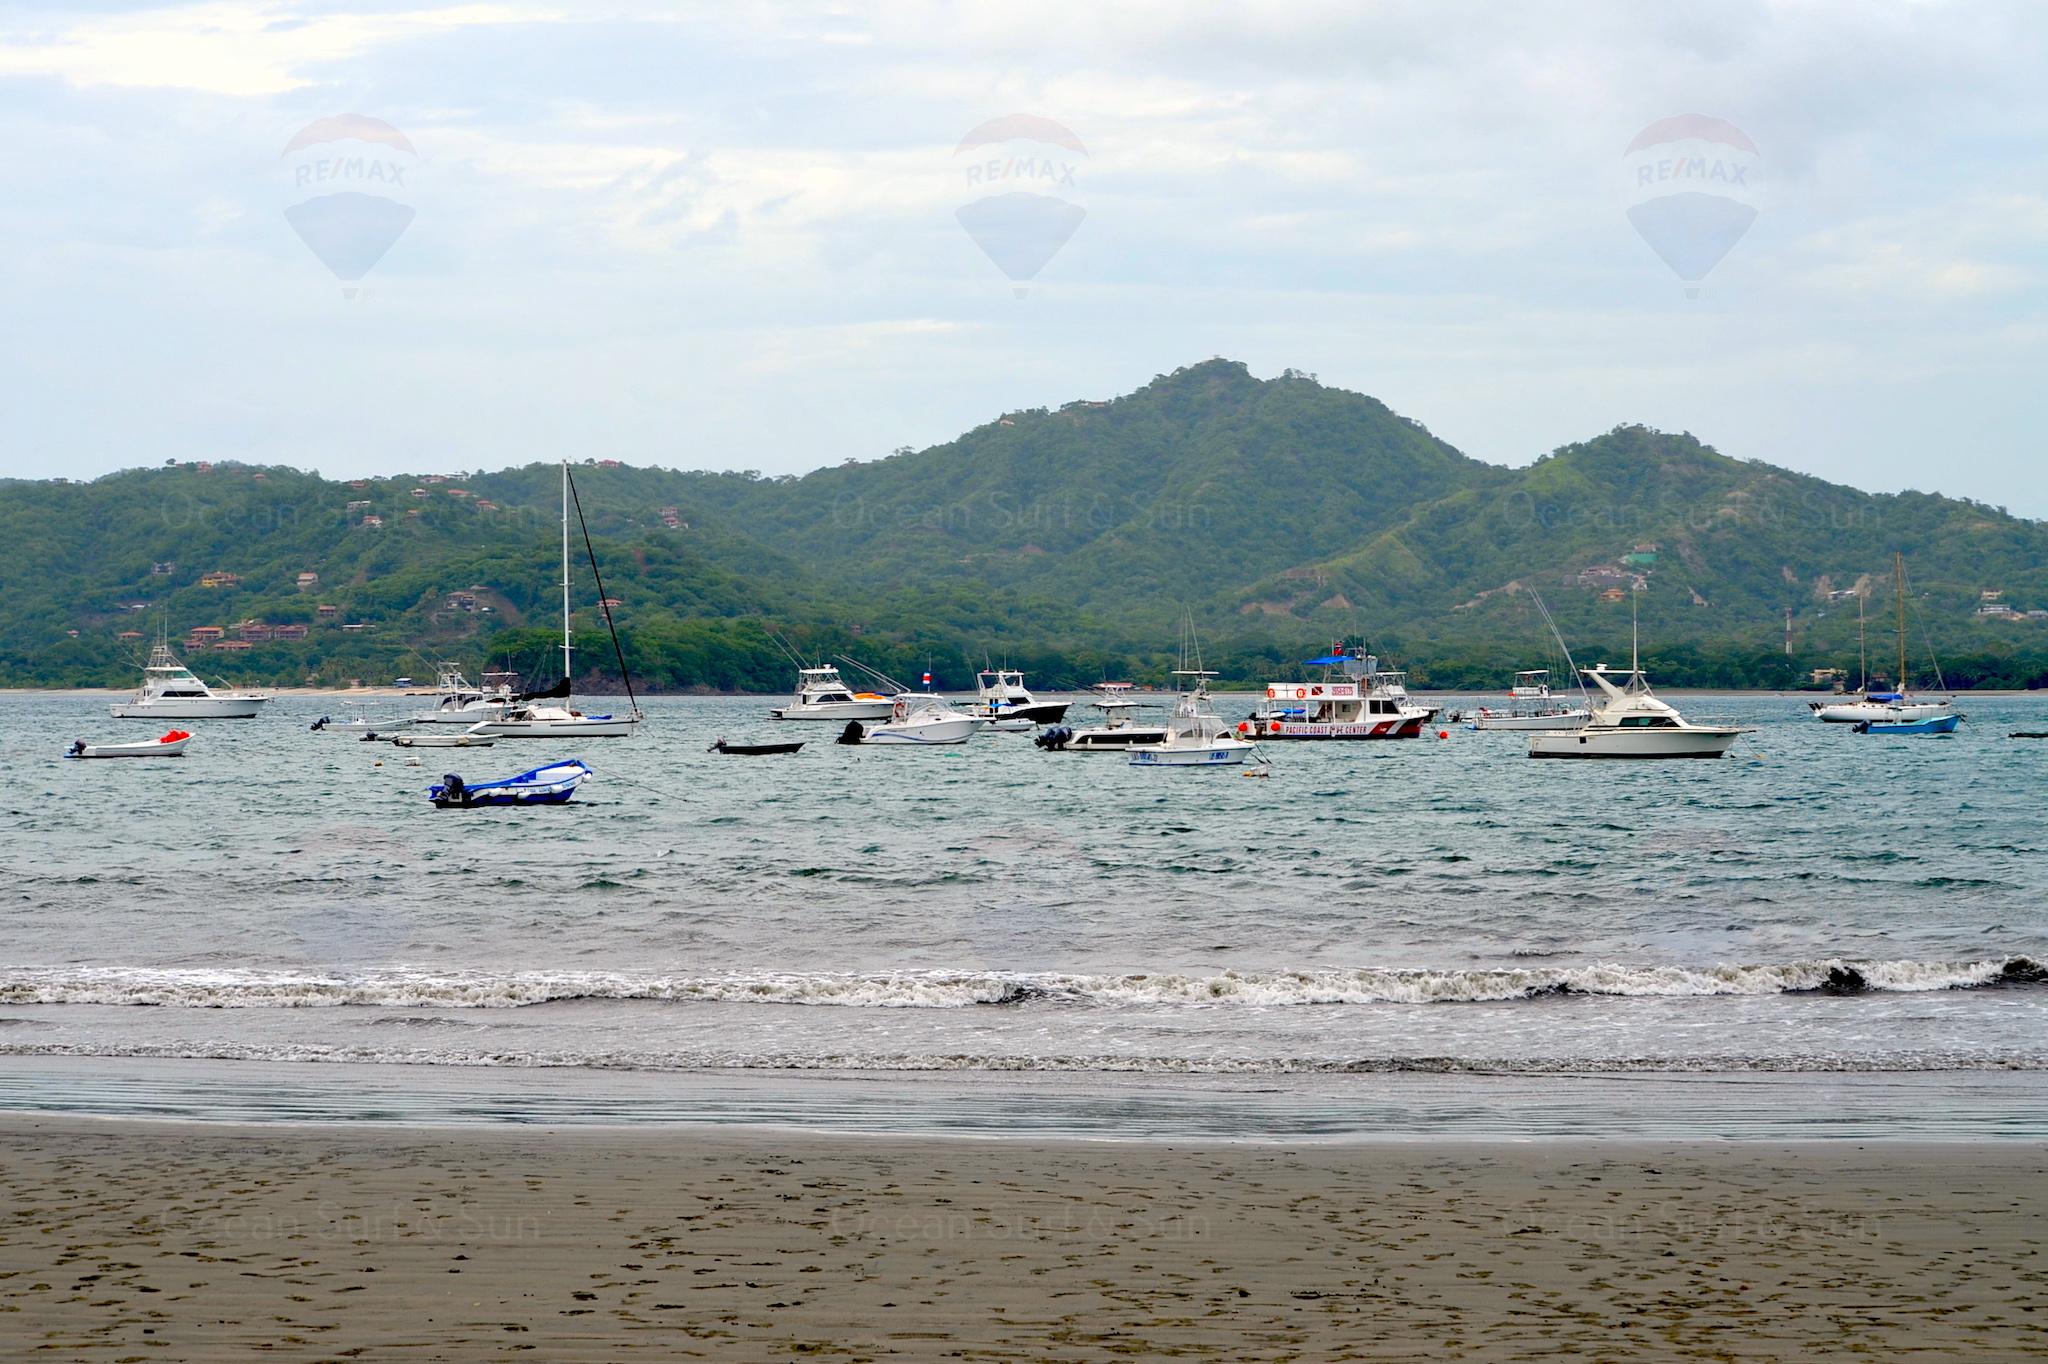 Playa-potrero